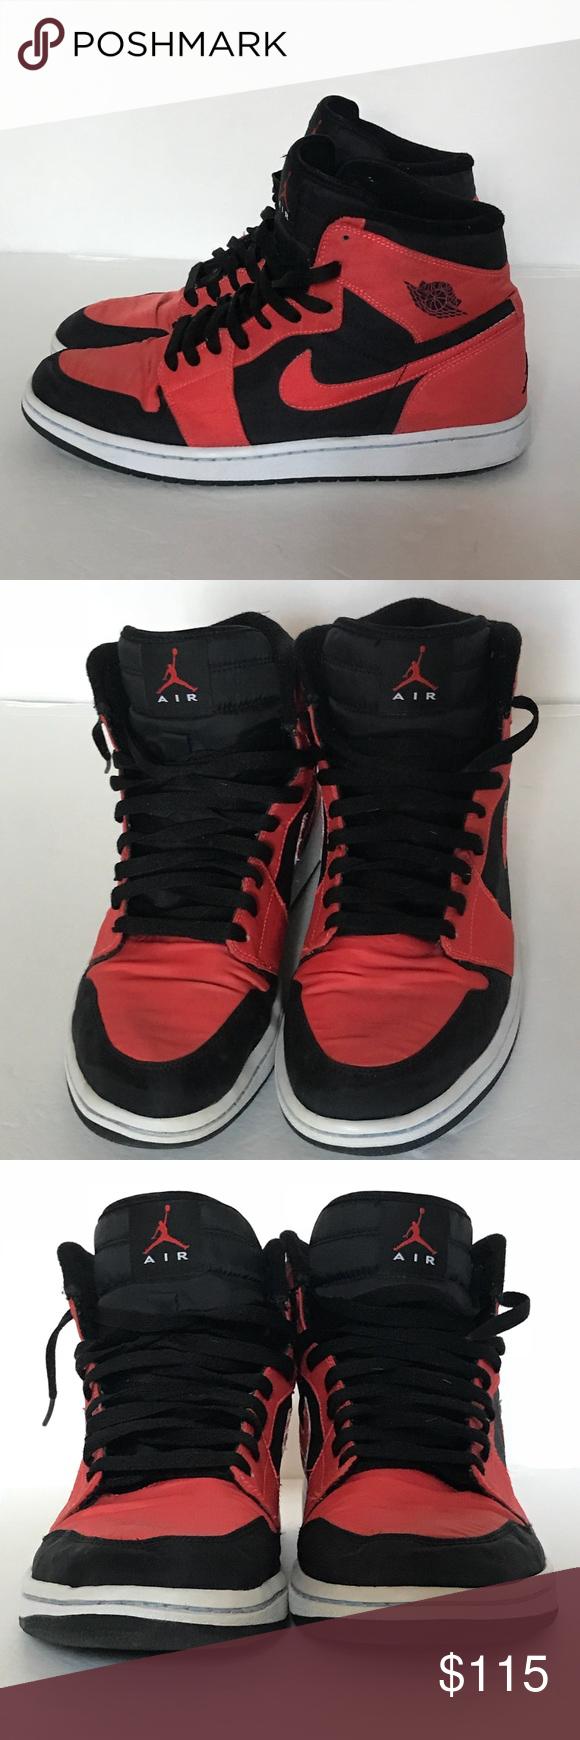 99f2afc4e0f6 2008 Nike Air Jordan 1 Retro High Black Max Orange Great Condition ... 2008 Nike  Air Jordan 1 Retro High s  344613-061 Size  11 Color  Black   Max Orange ...